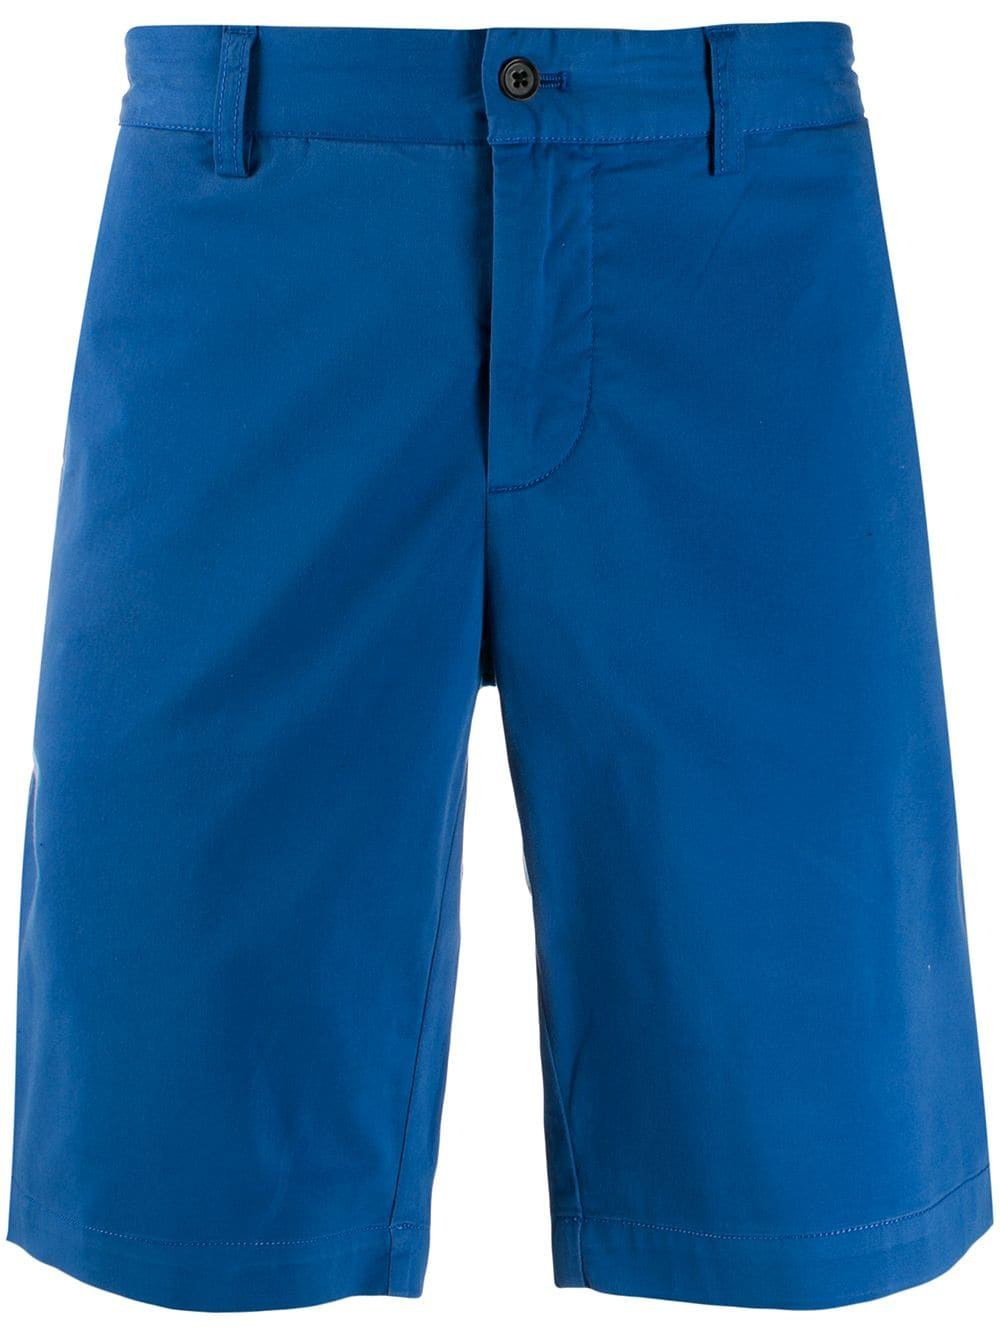 8430720c95 J.Lindeberg Nathan chino shorts - Blue in 2019 | Products | Chino ...